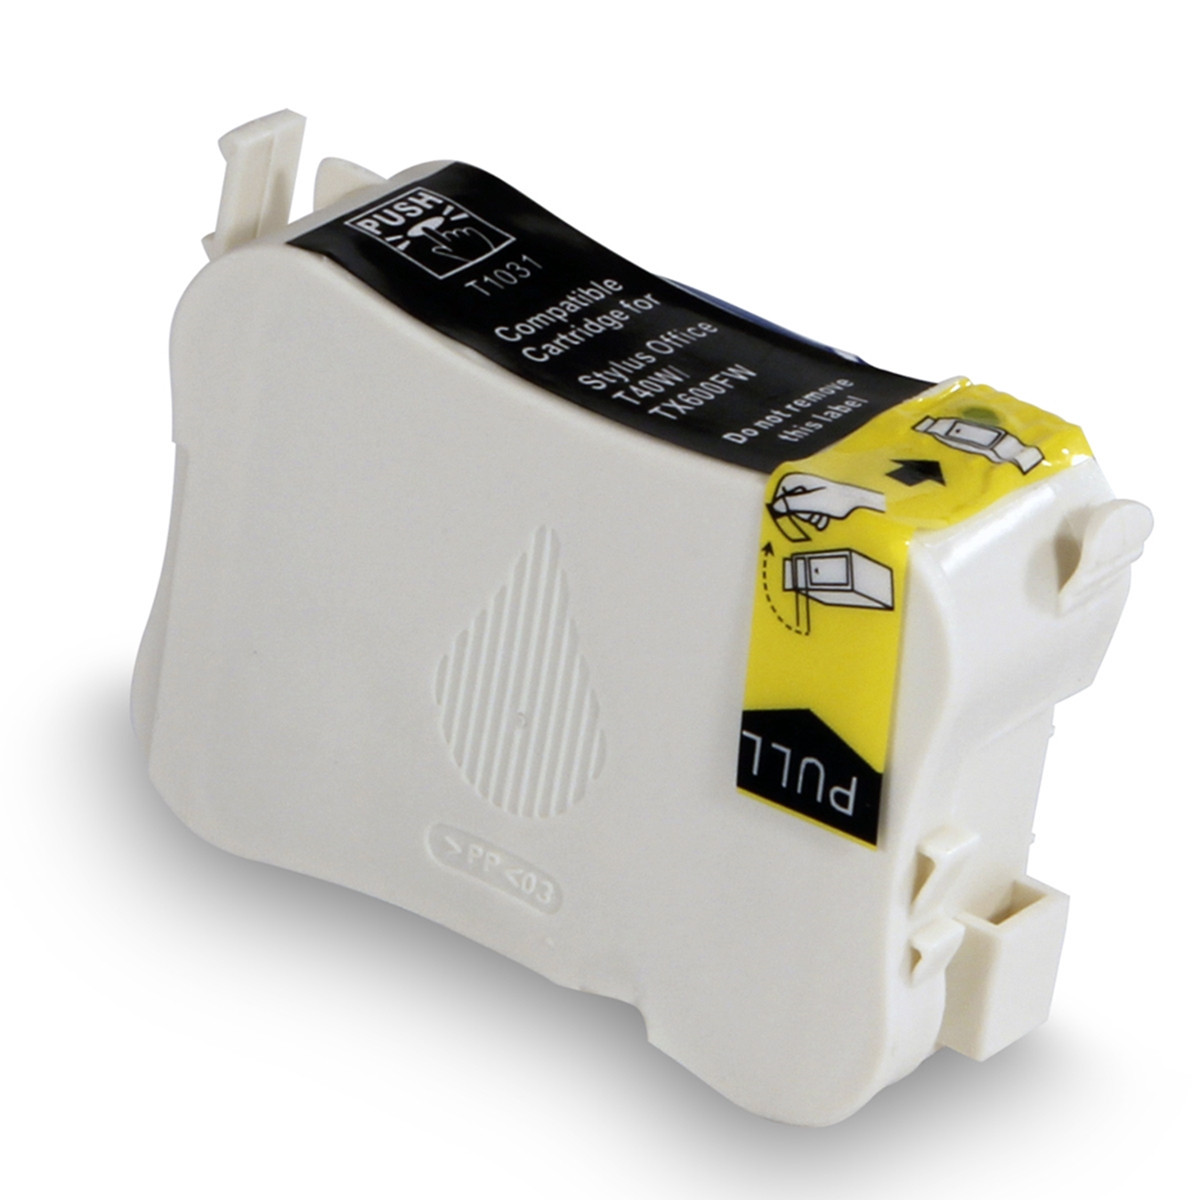 Cartucho de Tinta Compatível com Epson T103120 T103 T1031 Preto | T40W TX550W TX550FW TX600FW | 28ml